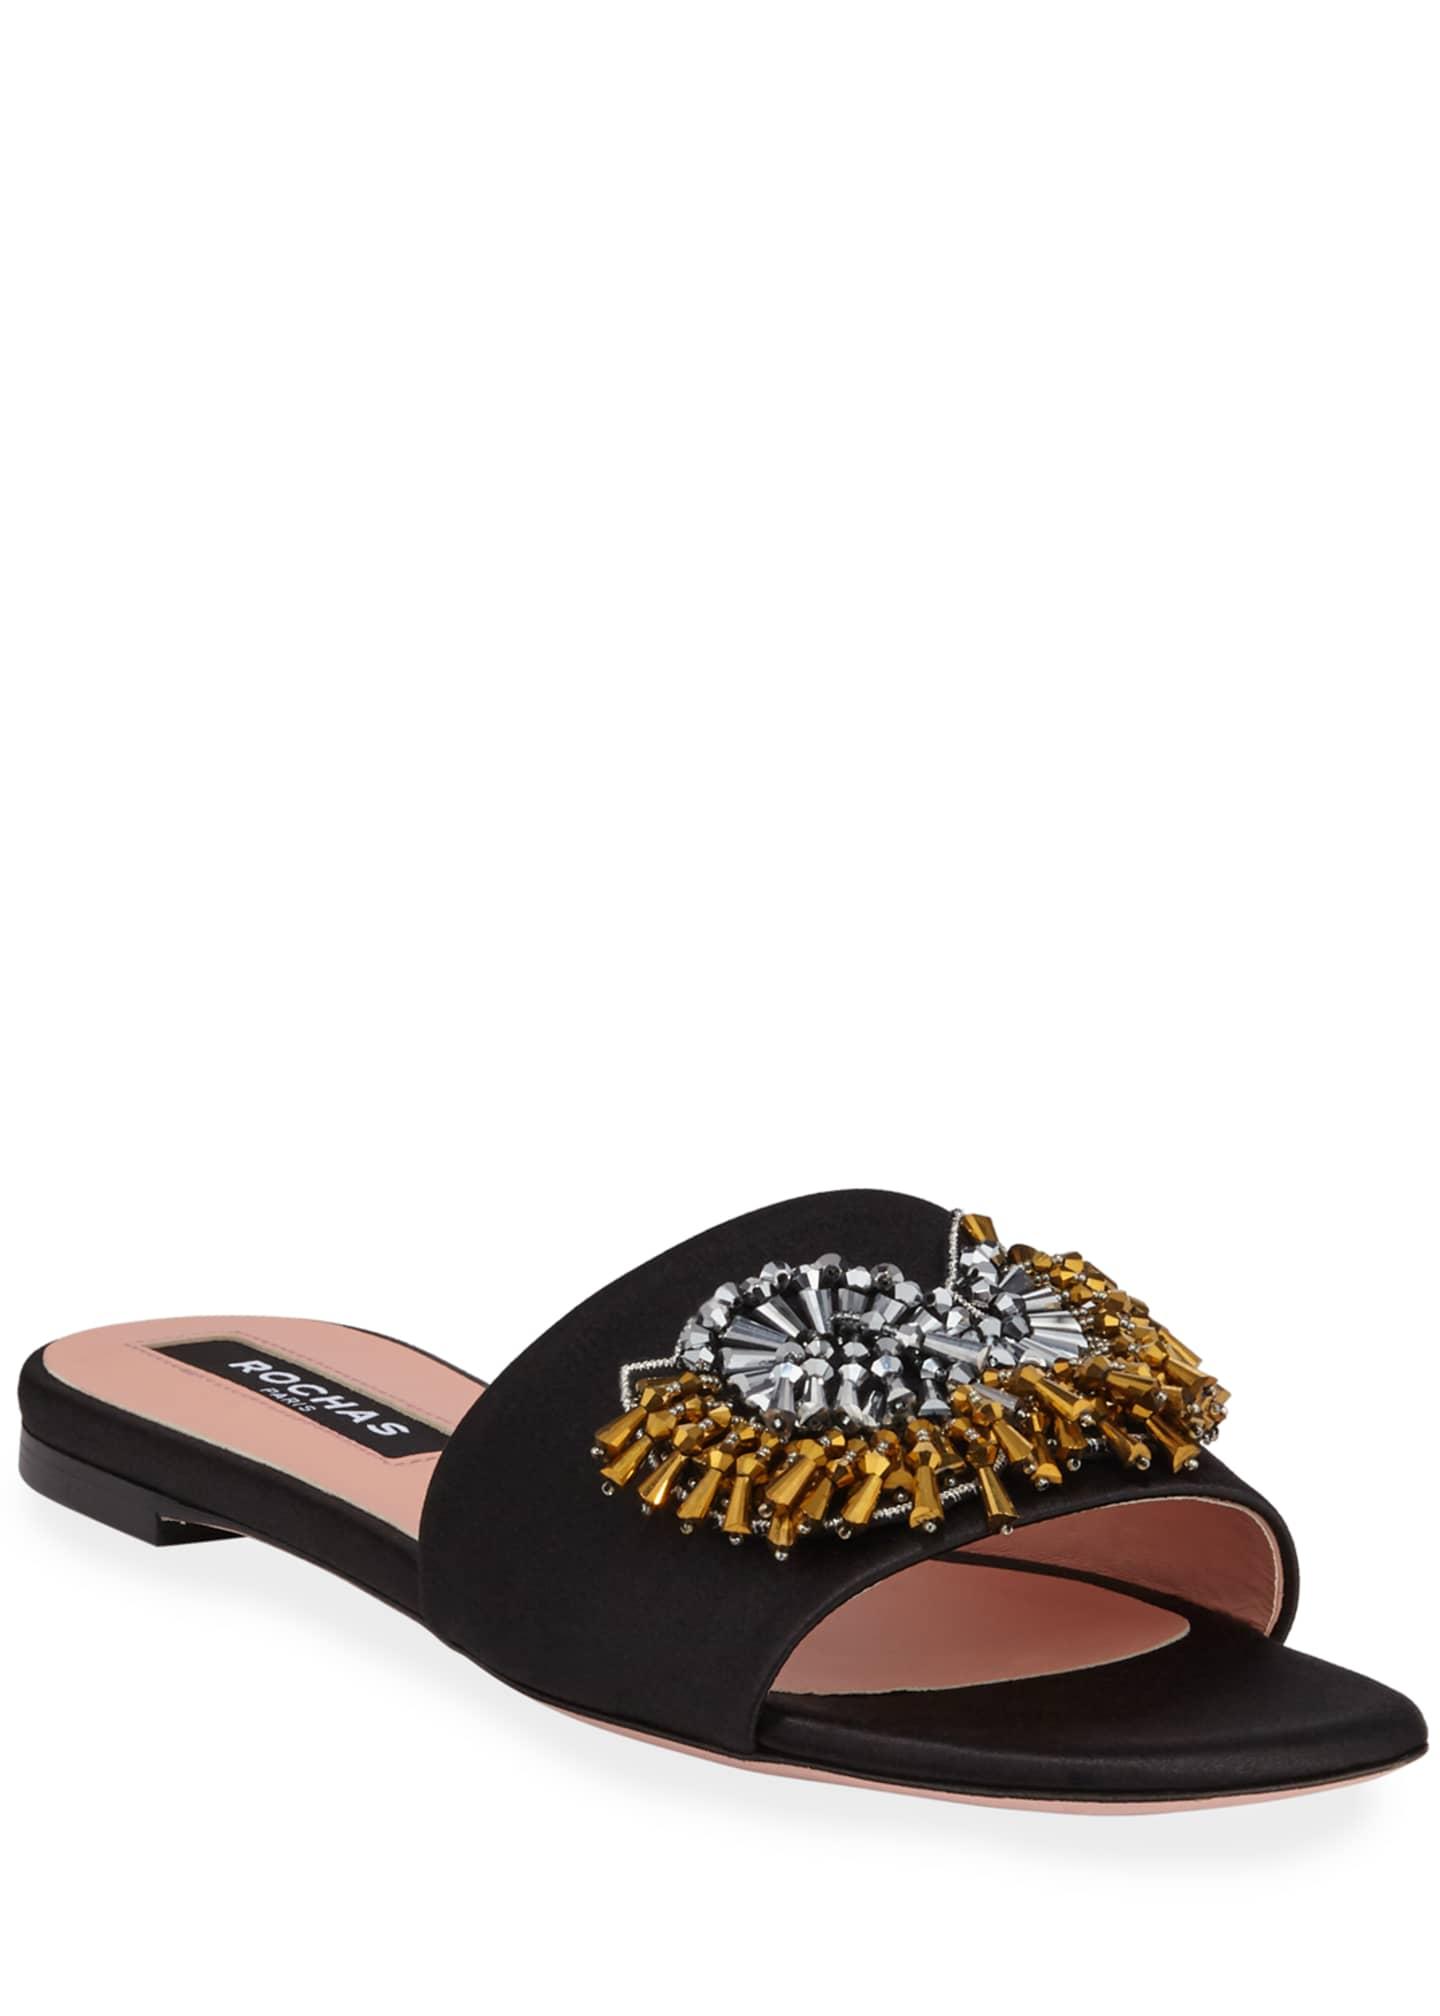 Rochas Broach Beaded Satin Slide Sandals